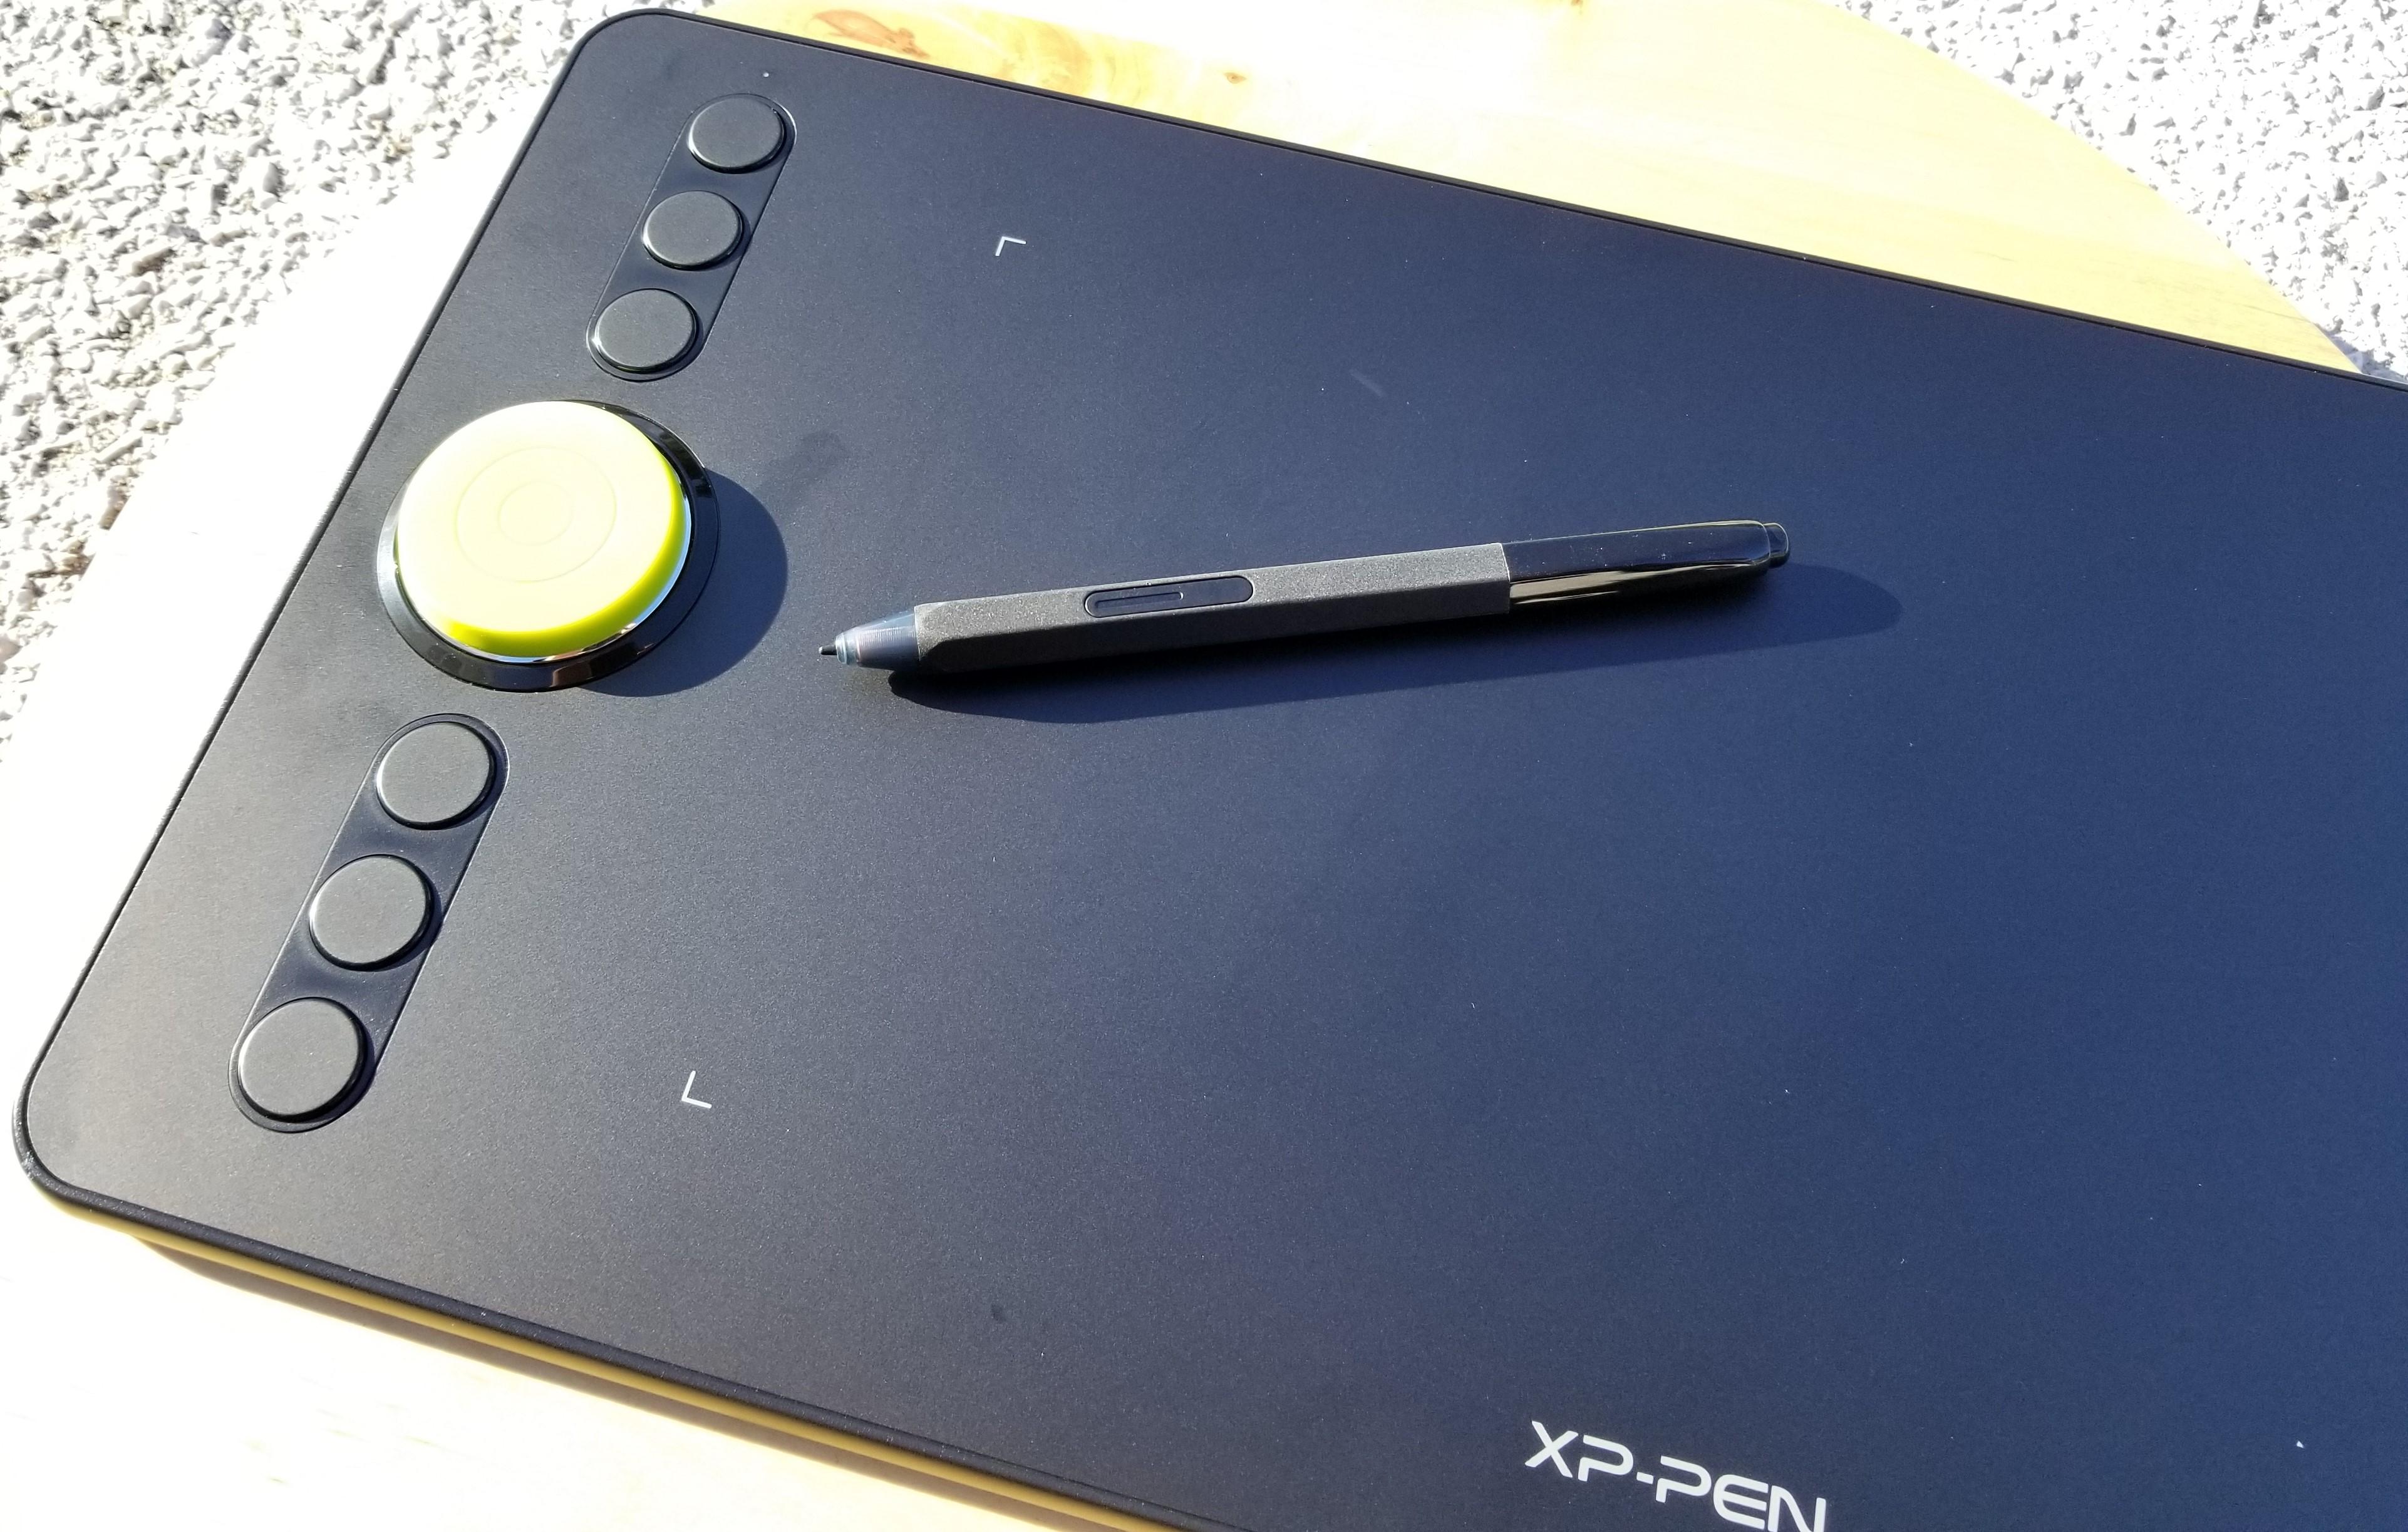 XP-Pen Deco02